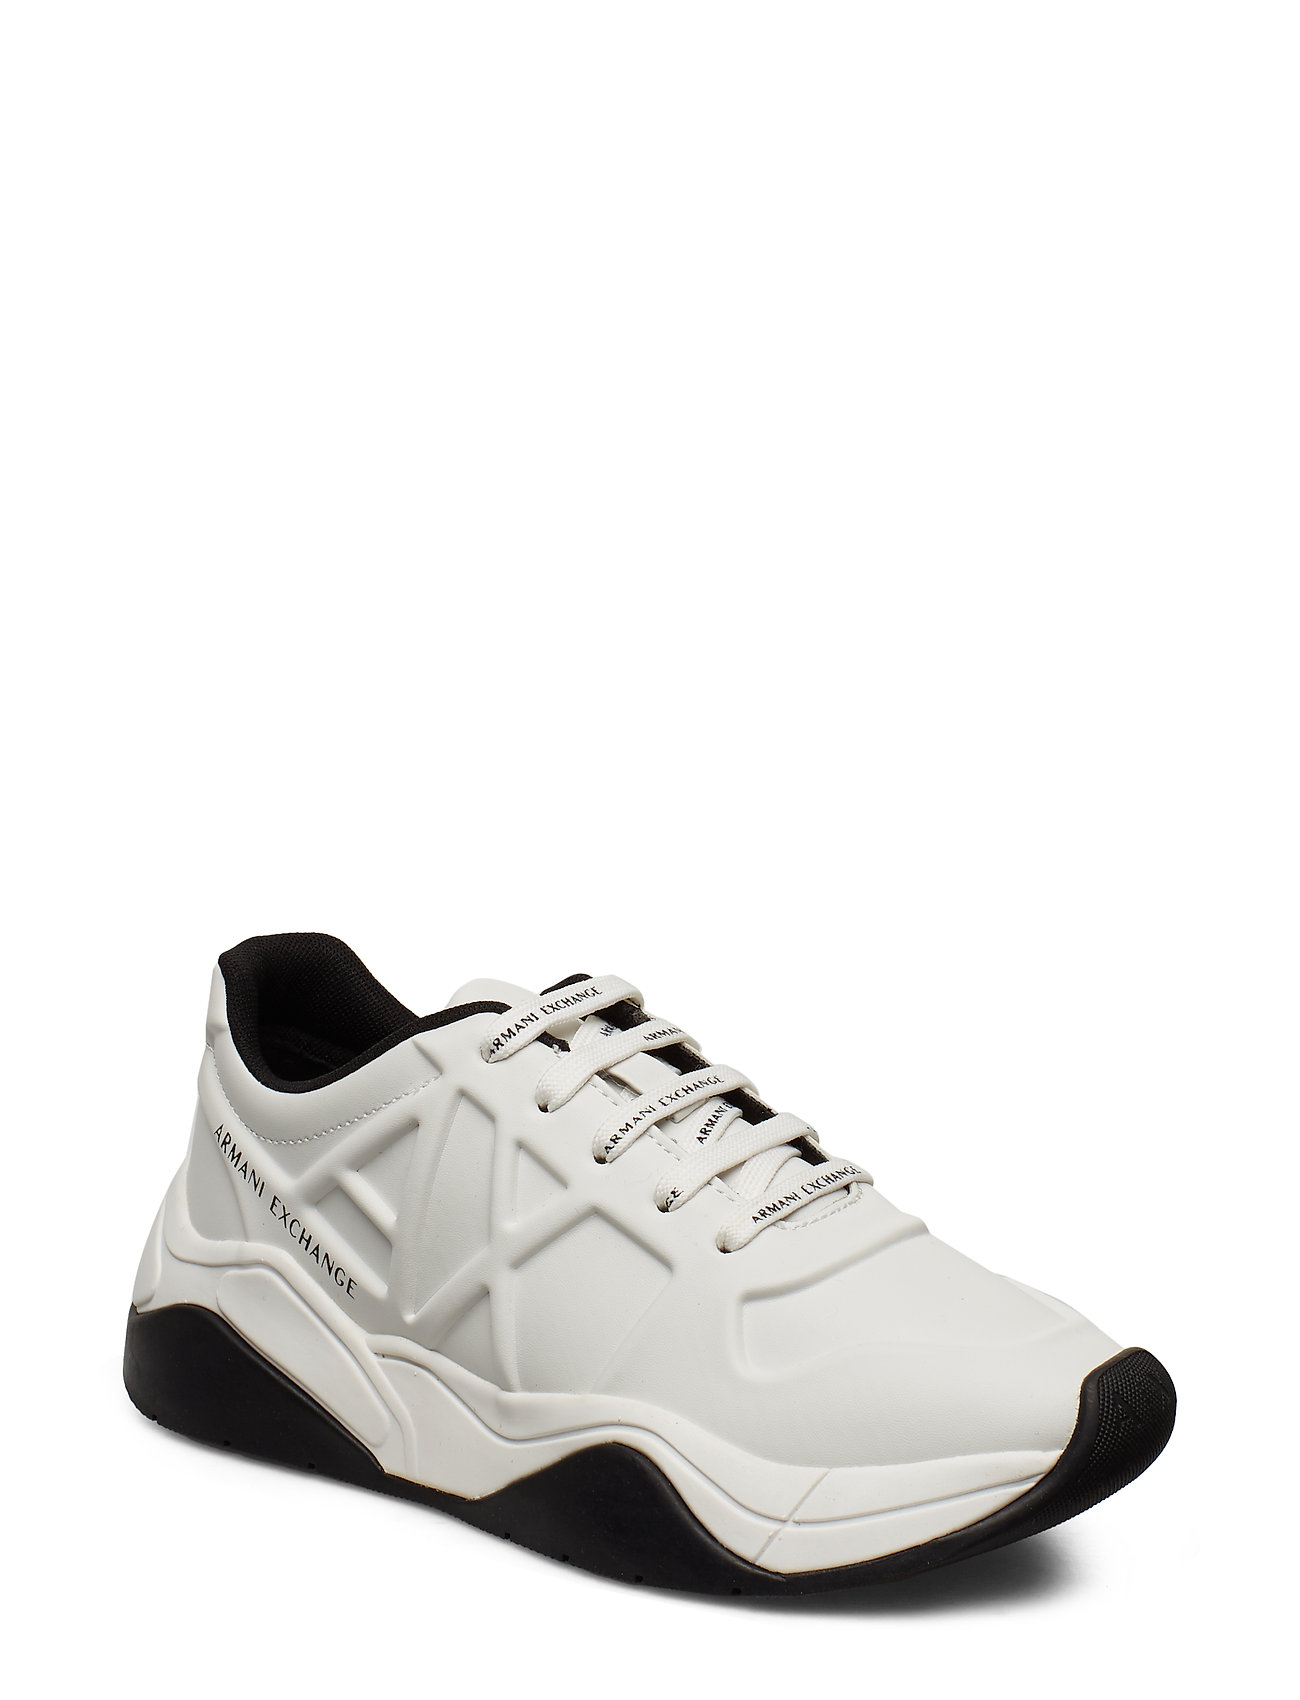 ARMANI EXCHANGE Ax Woman Shoes Niedrige Sneaker Weiß ARMANI EXCHANGE